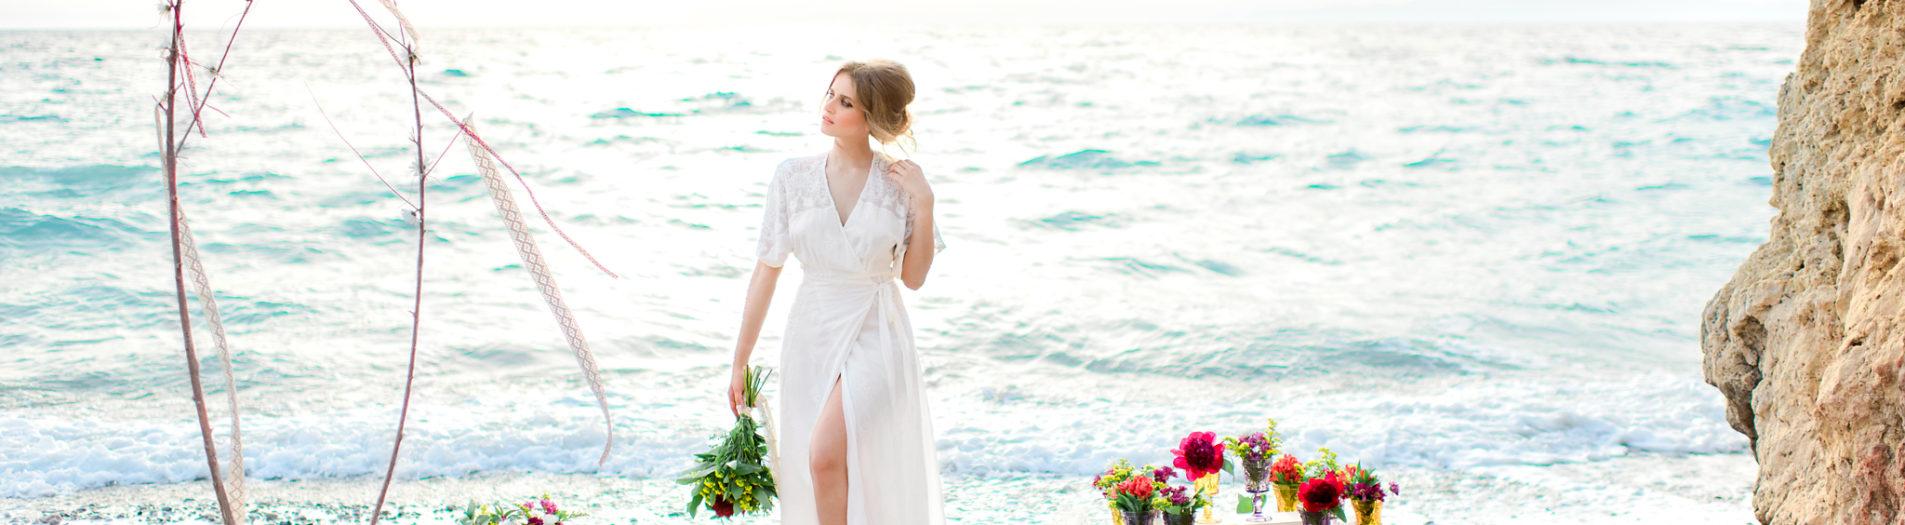 Bohemian wedding style shoot